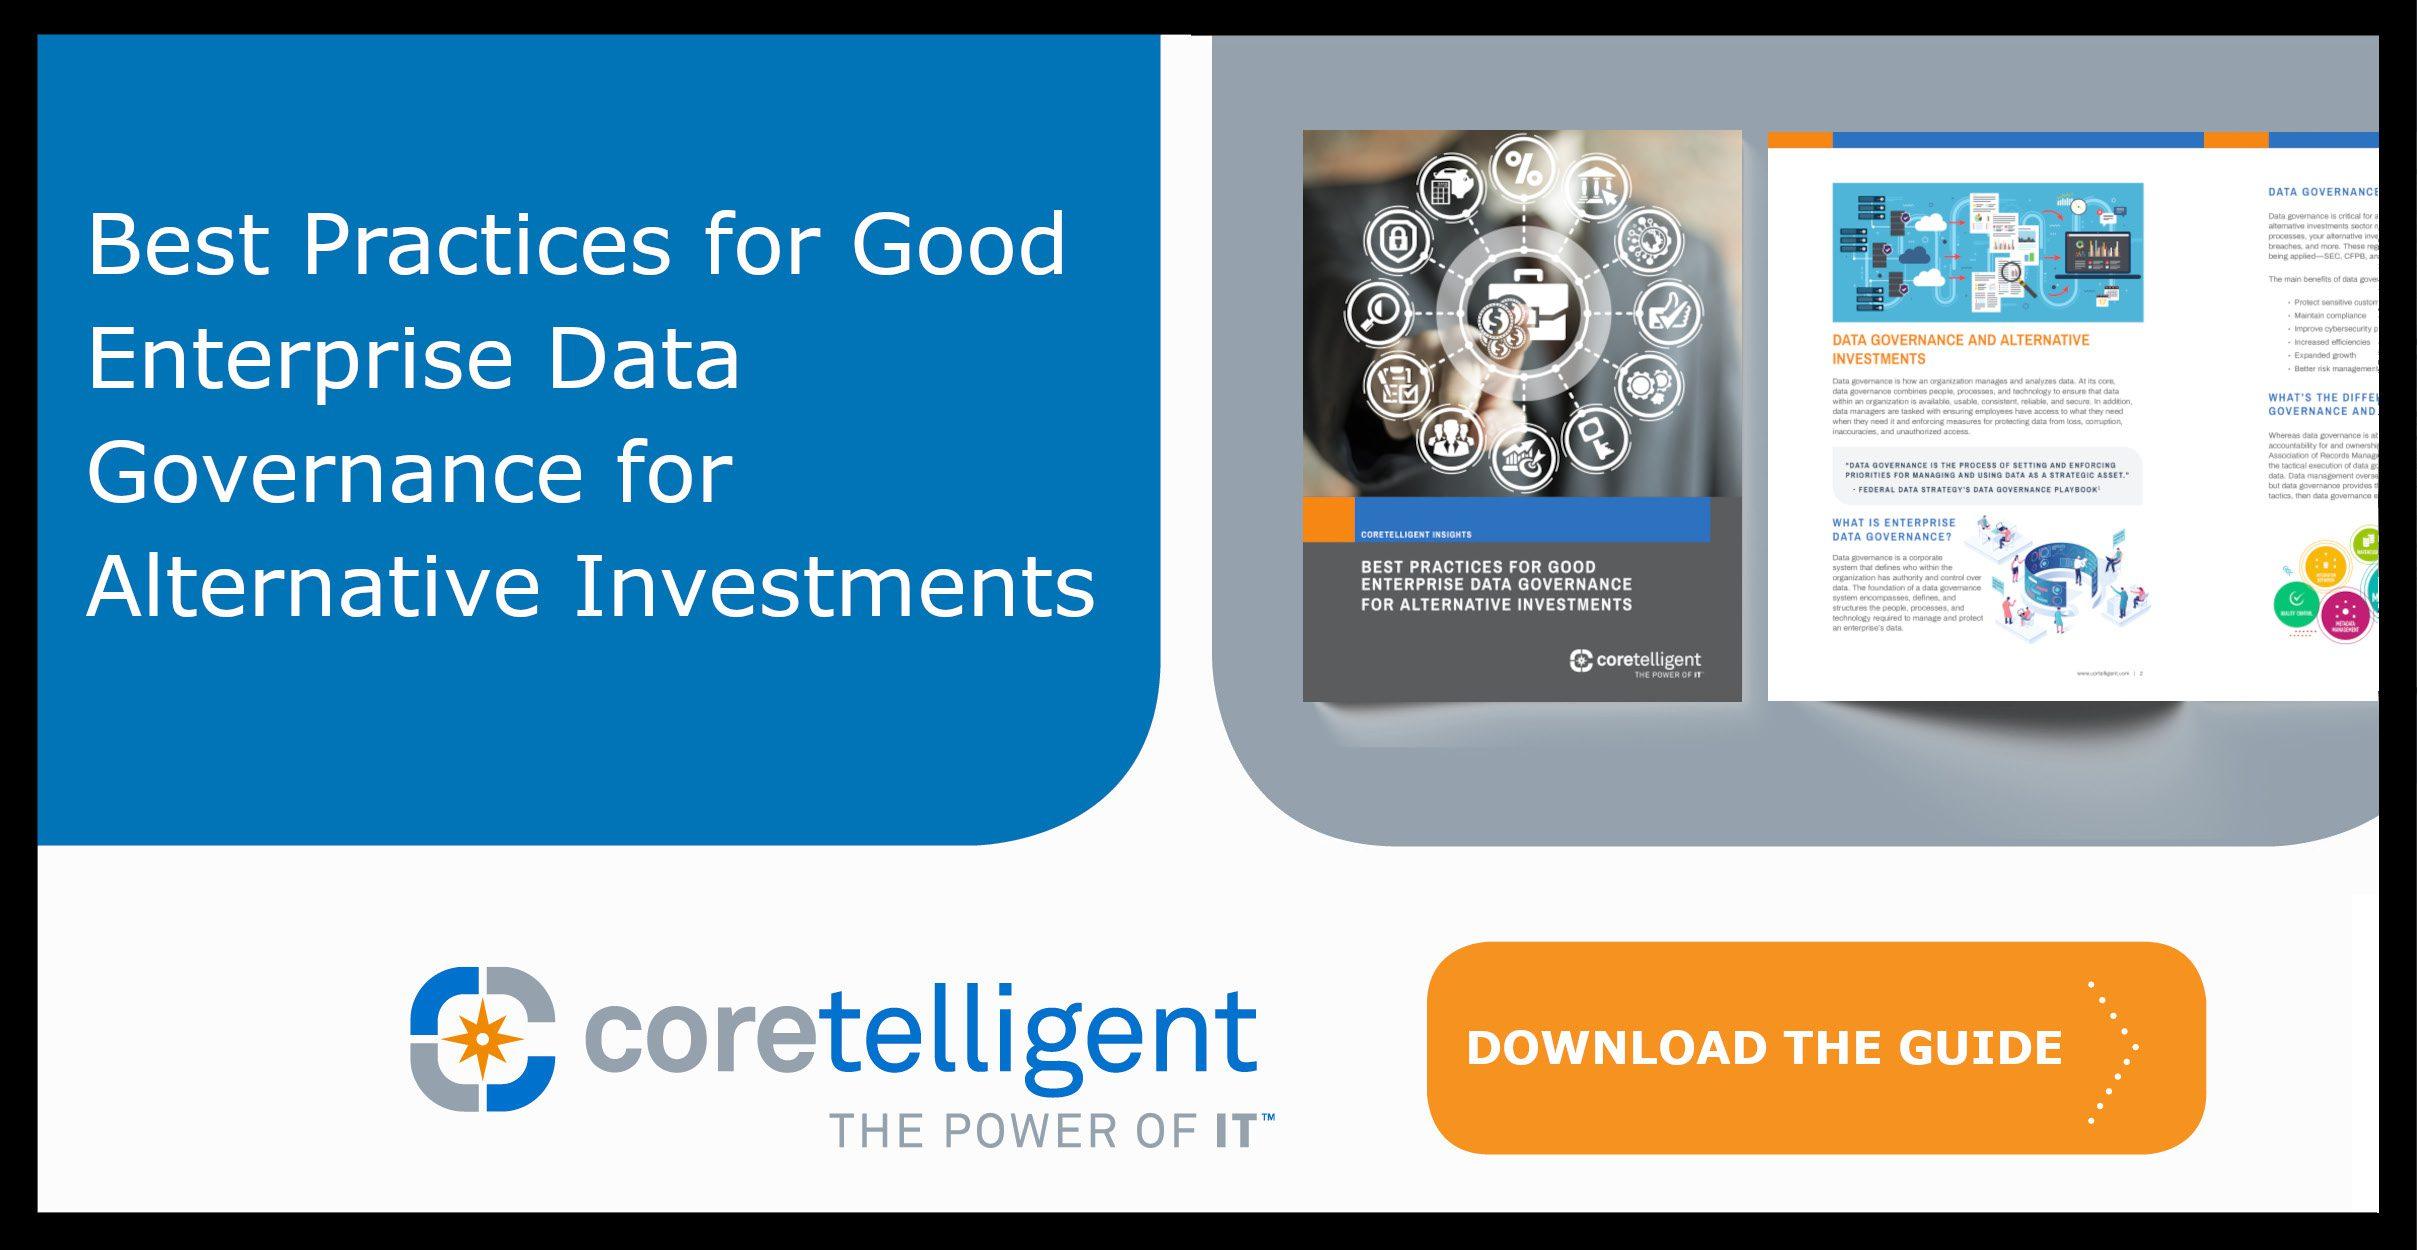 Best Practices for Good Enterprise Data Governance for Alternative Investments